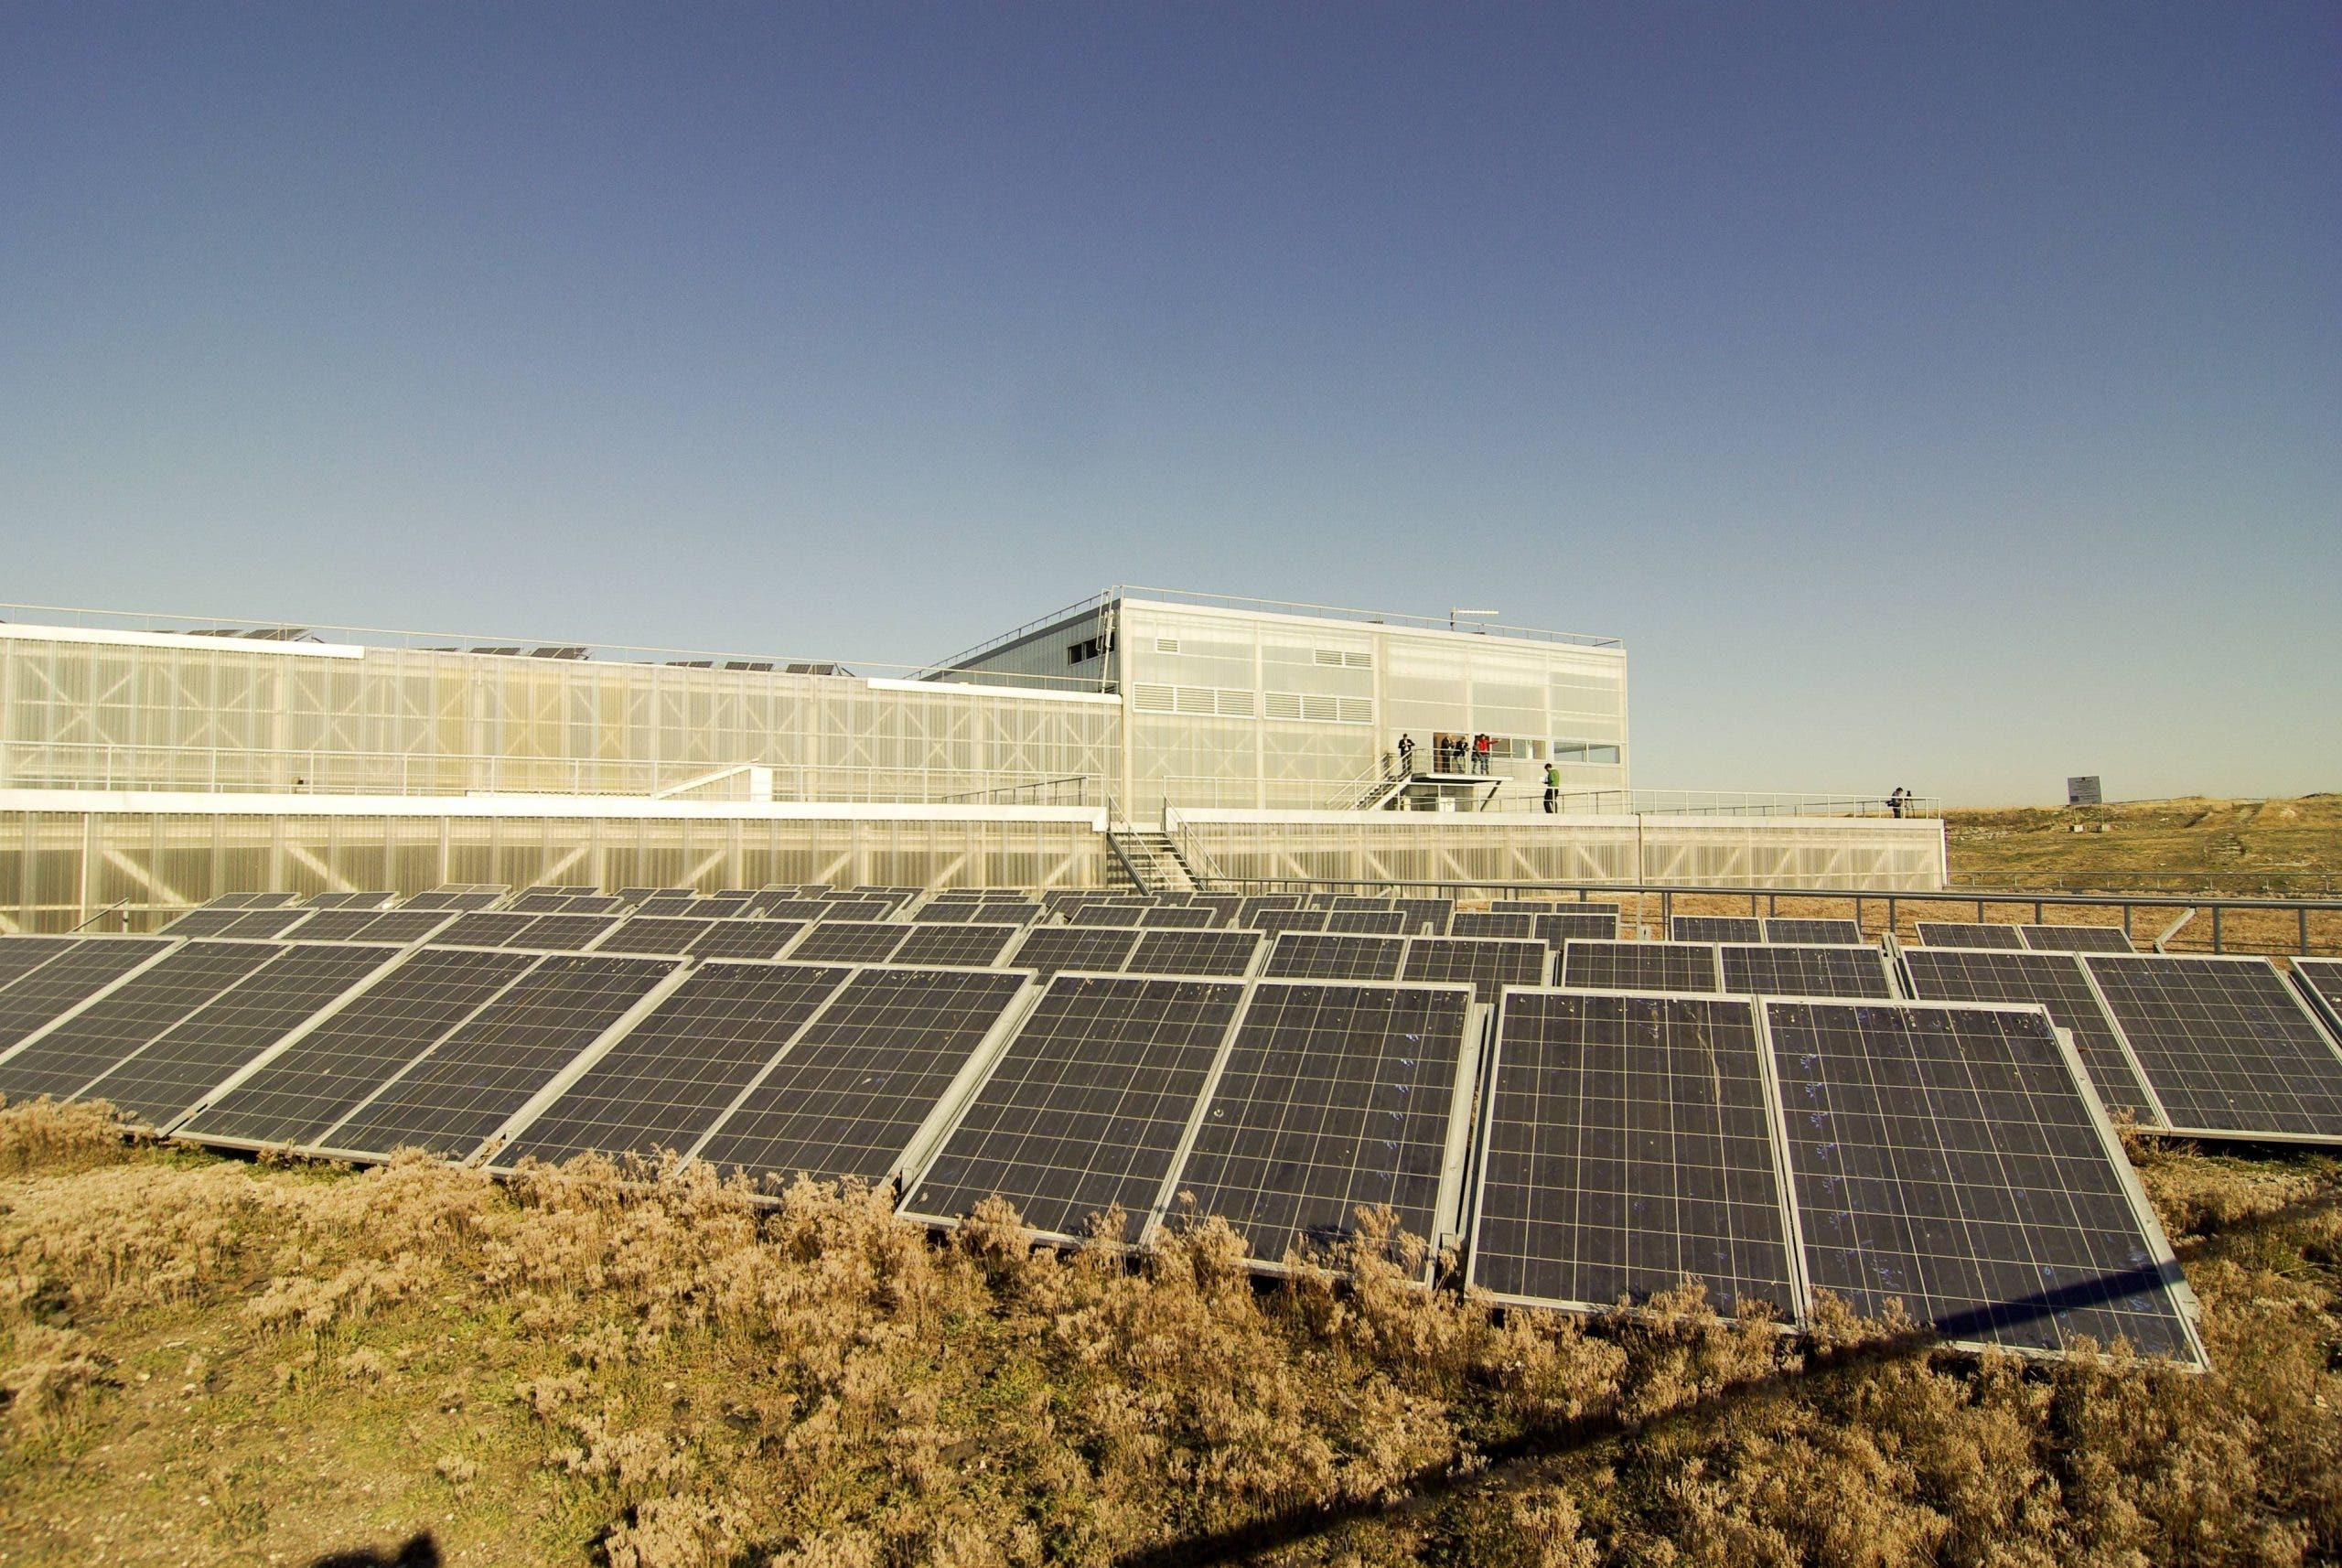 A solar energy installation